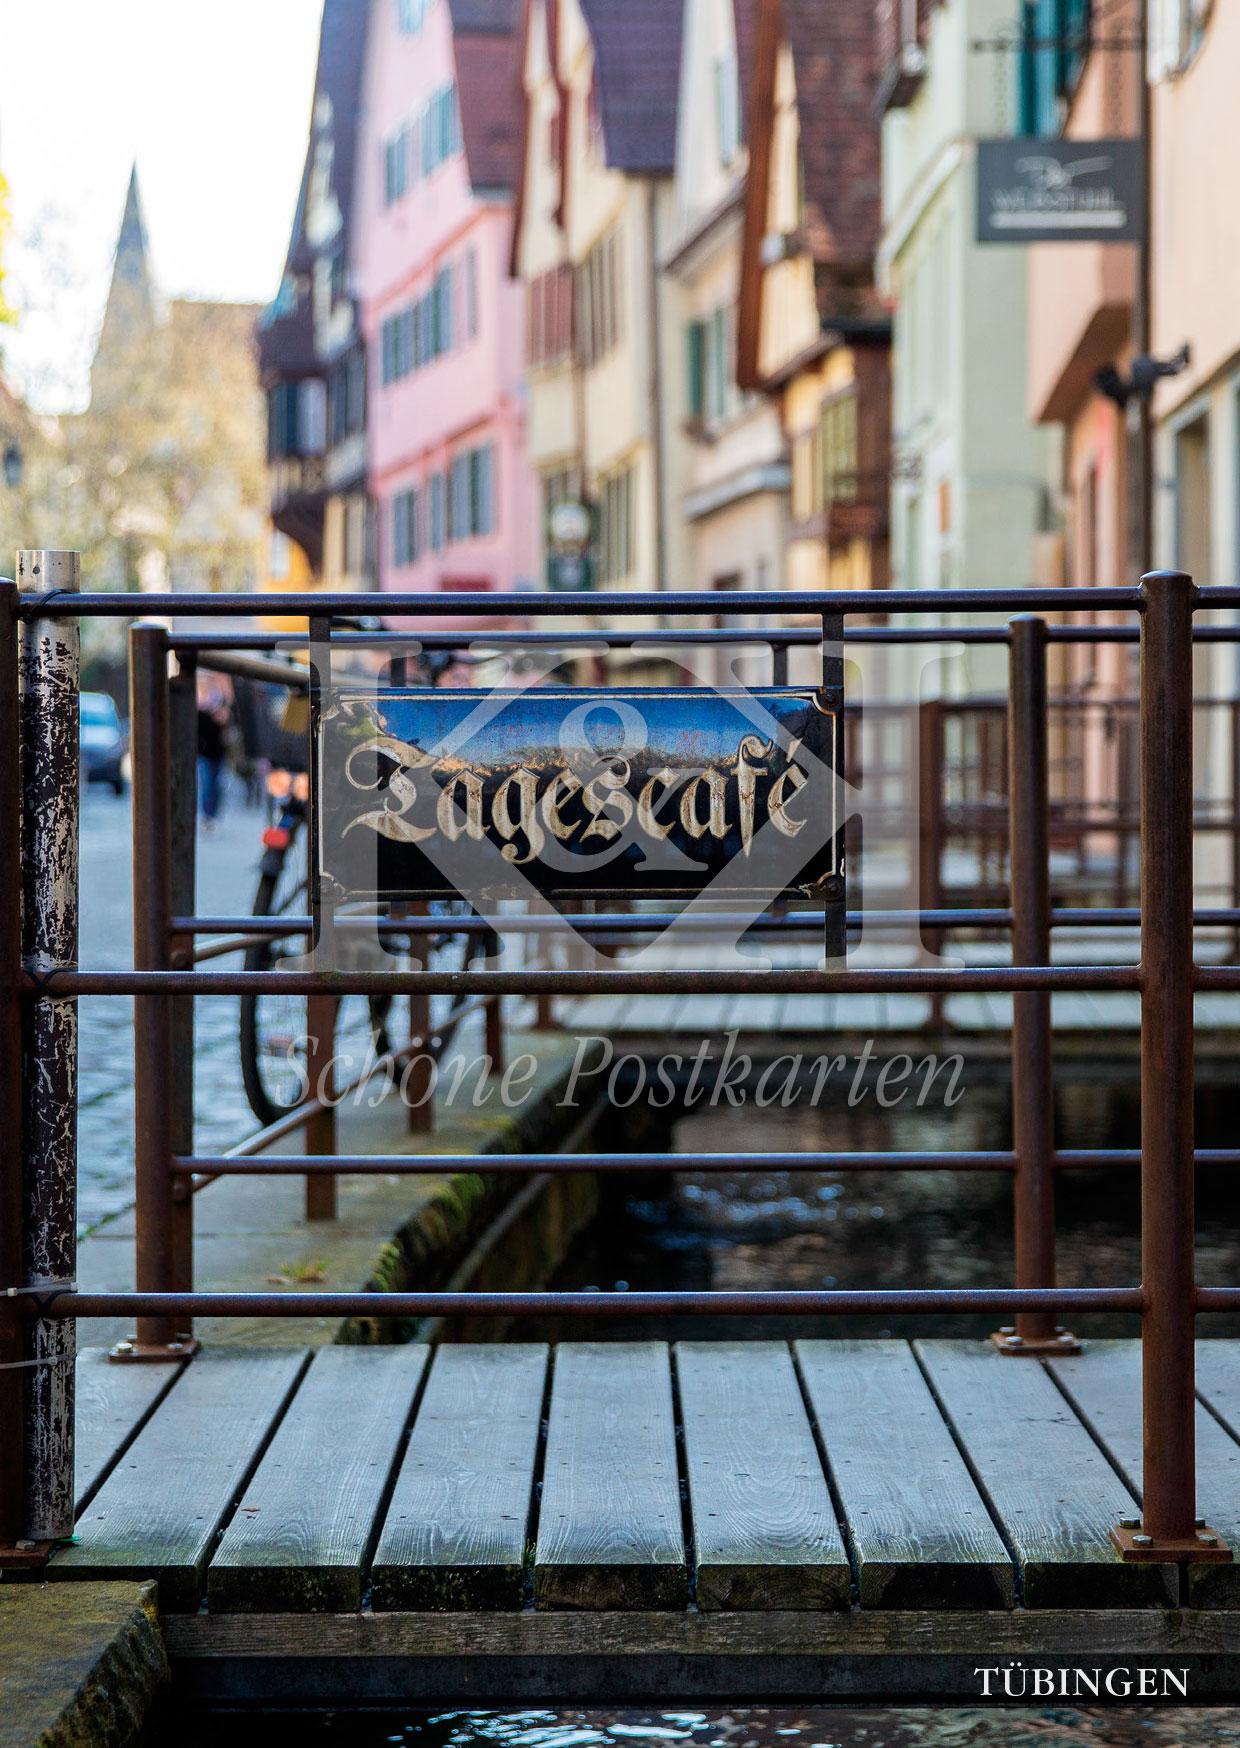 <strong>Schöne Postkarte Nr. 247</strong> · Tagescafé: Ammergasse in Tübingen © 2018